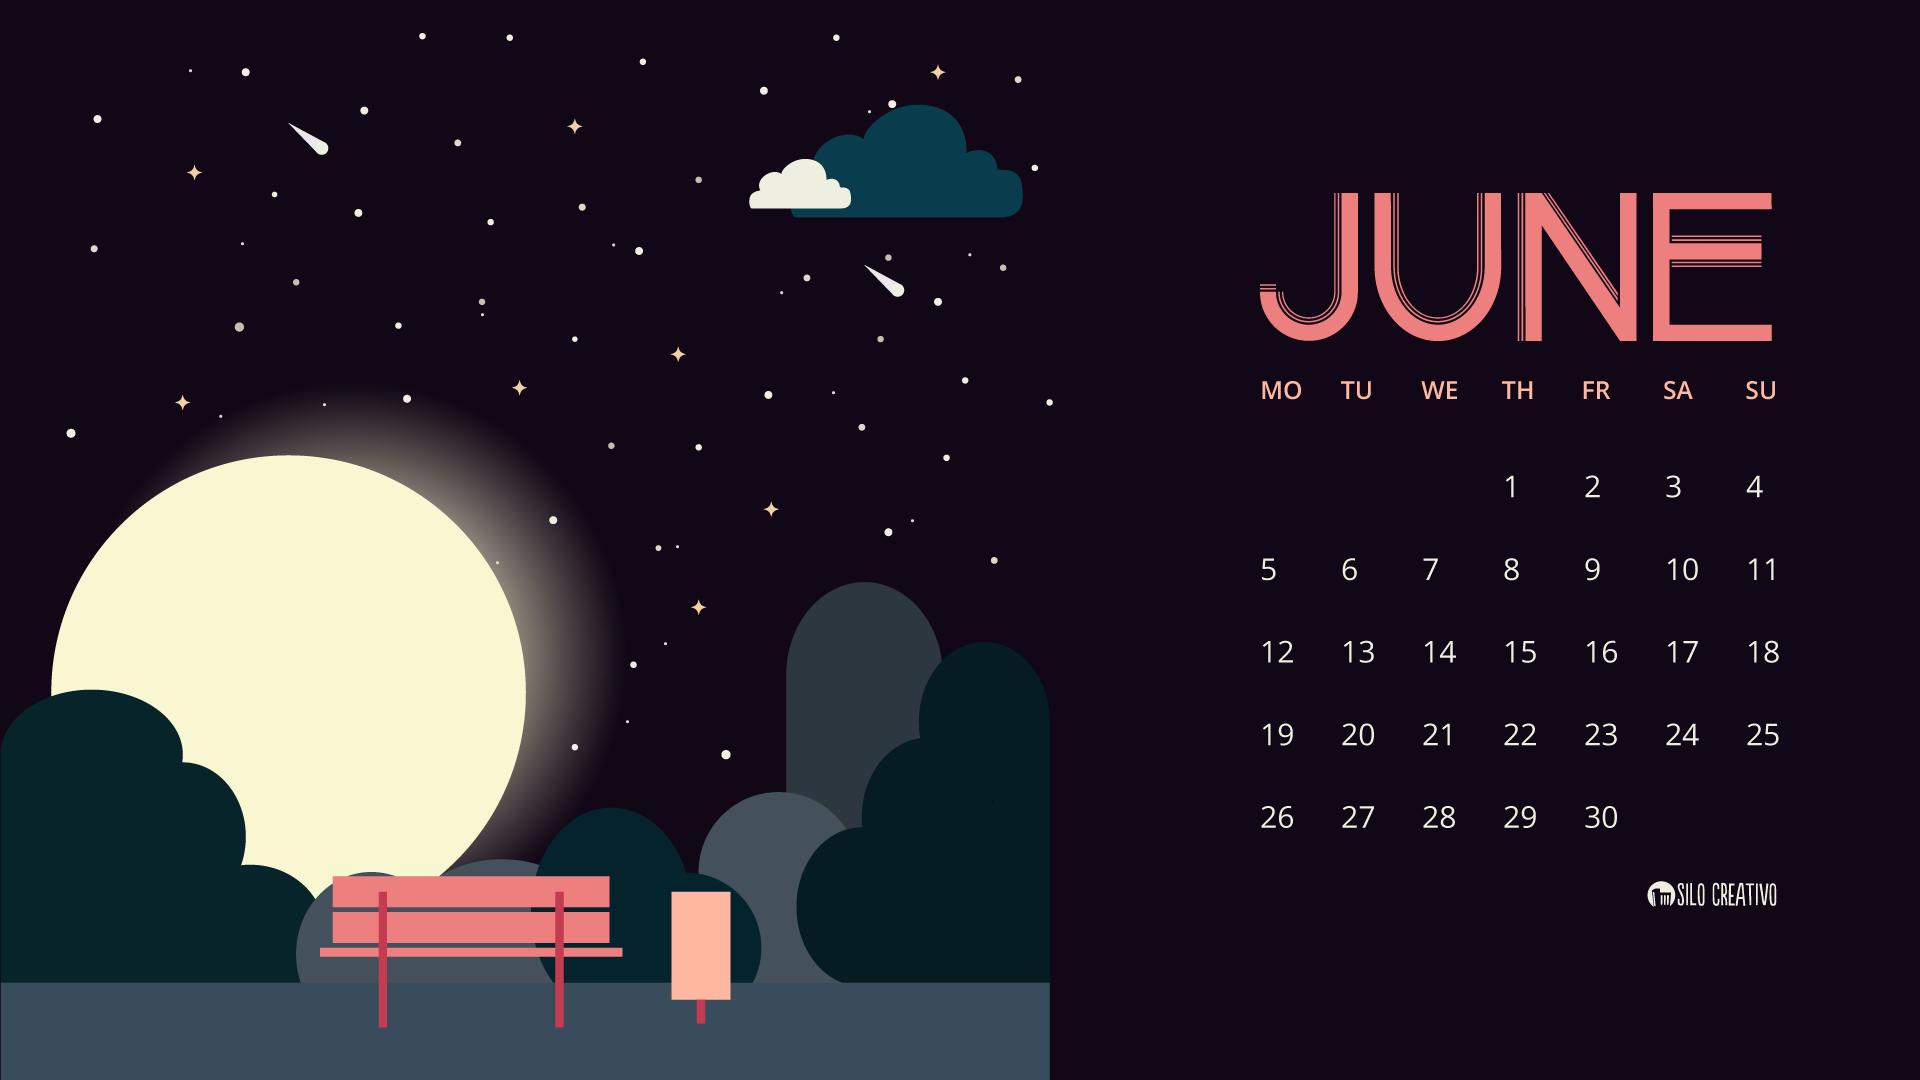 June Calendar Girl Series : Downloadable calendar june silo creativo